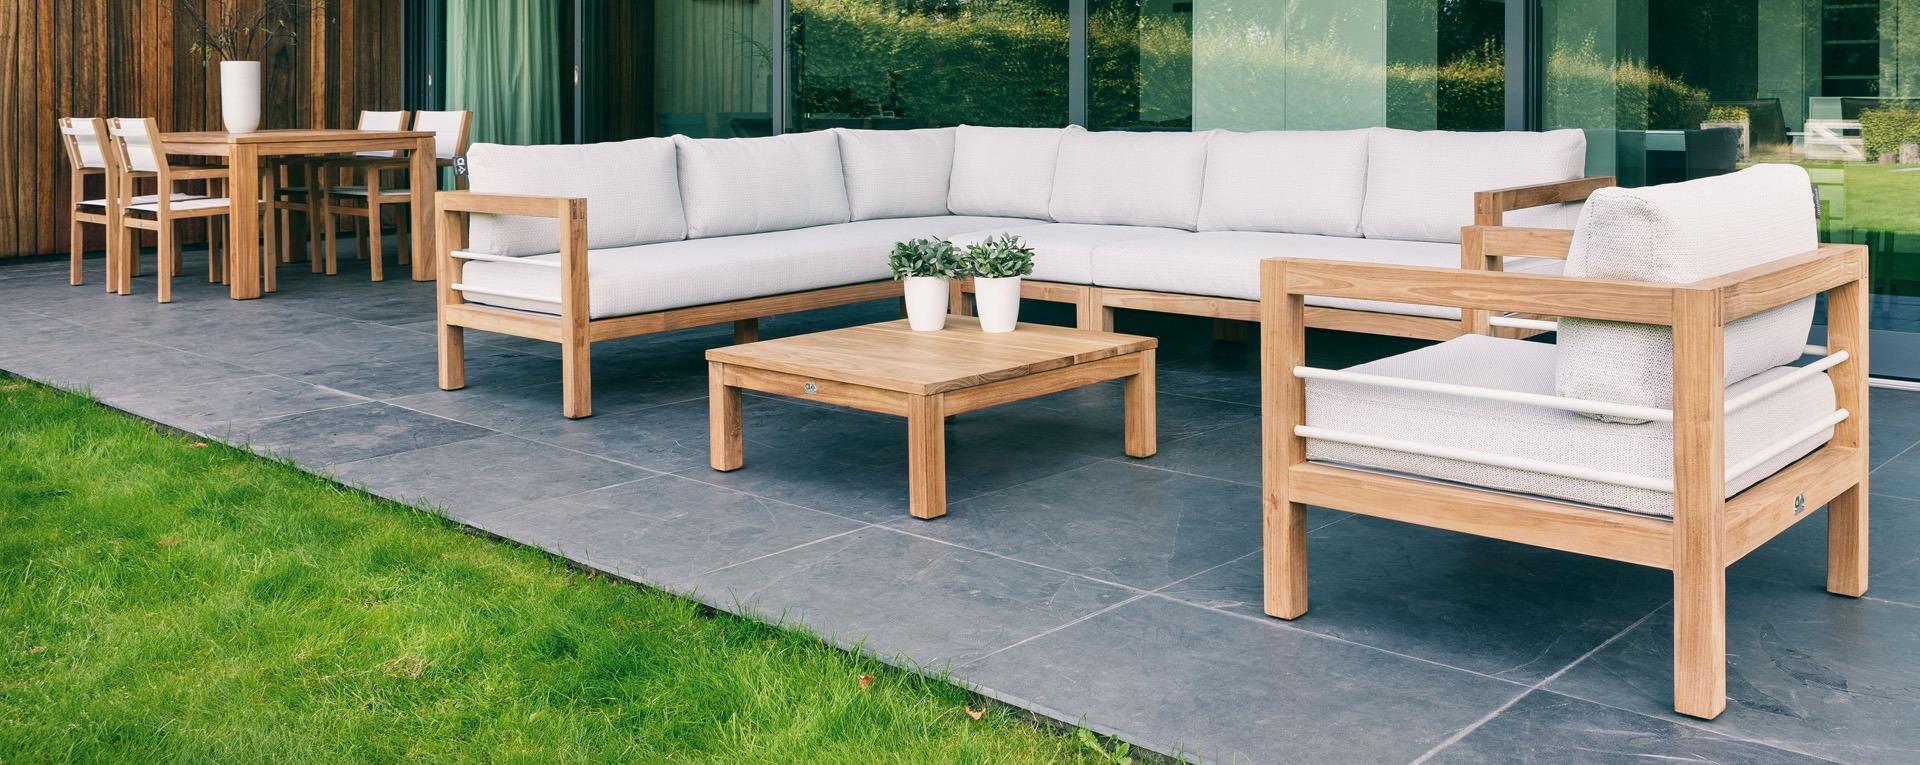 Swell Applebee Frejus Loungeset Premium Line Tuinmeubelkorting Inzonedesignstudio Interior Chair Design Inzonedesignstudiocom